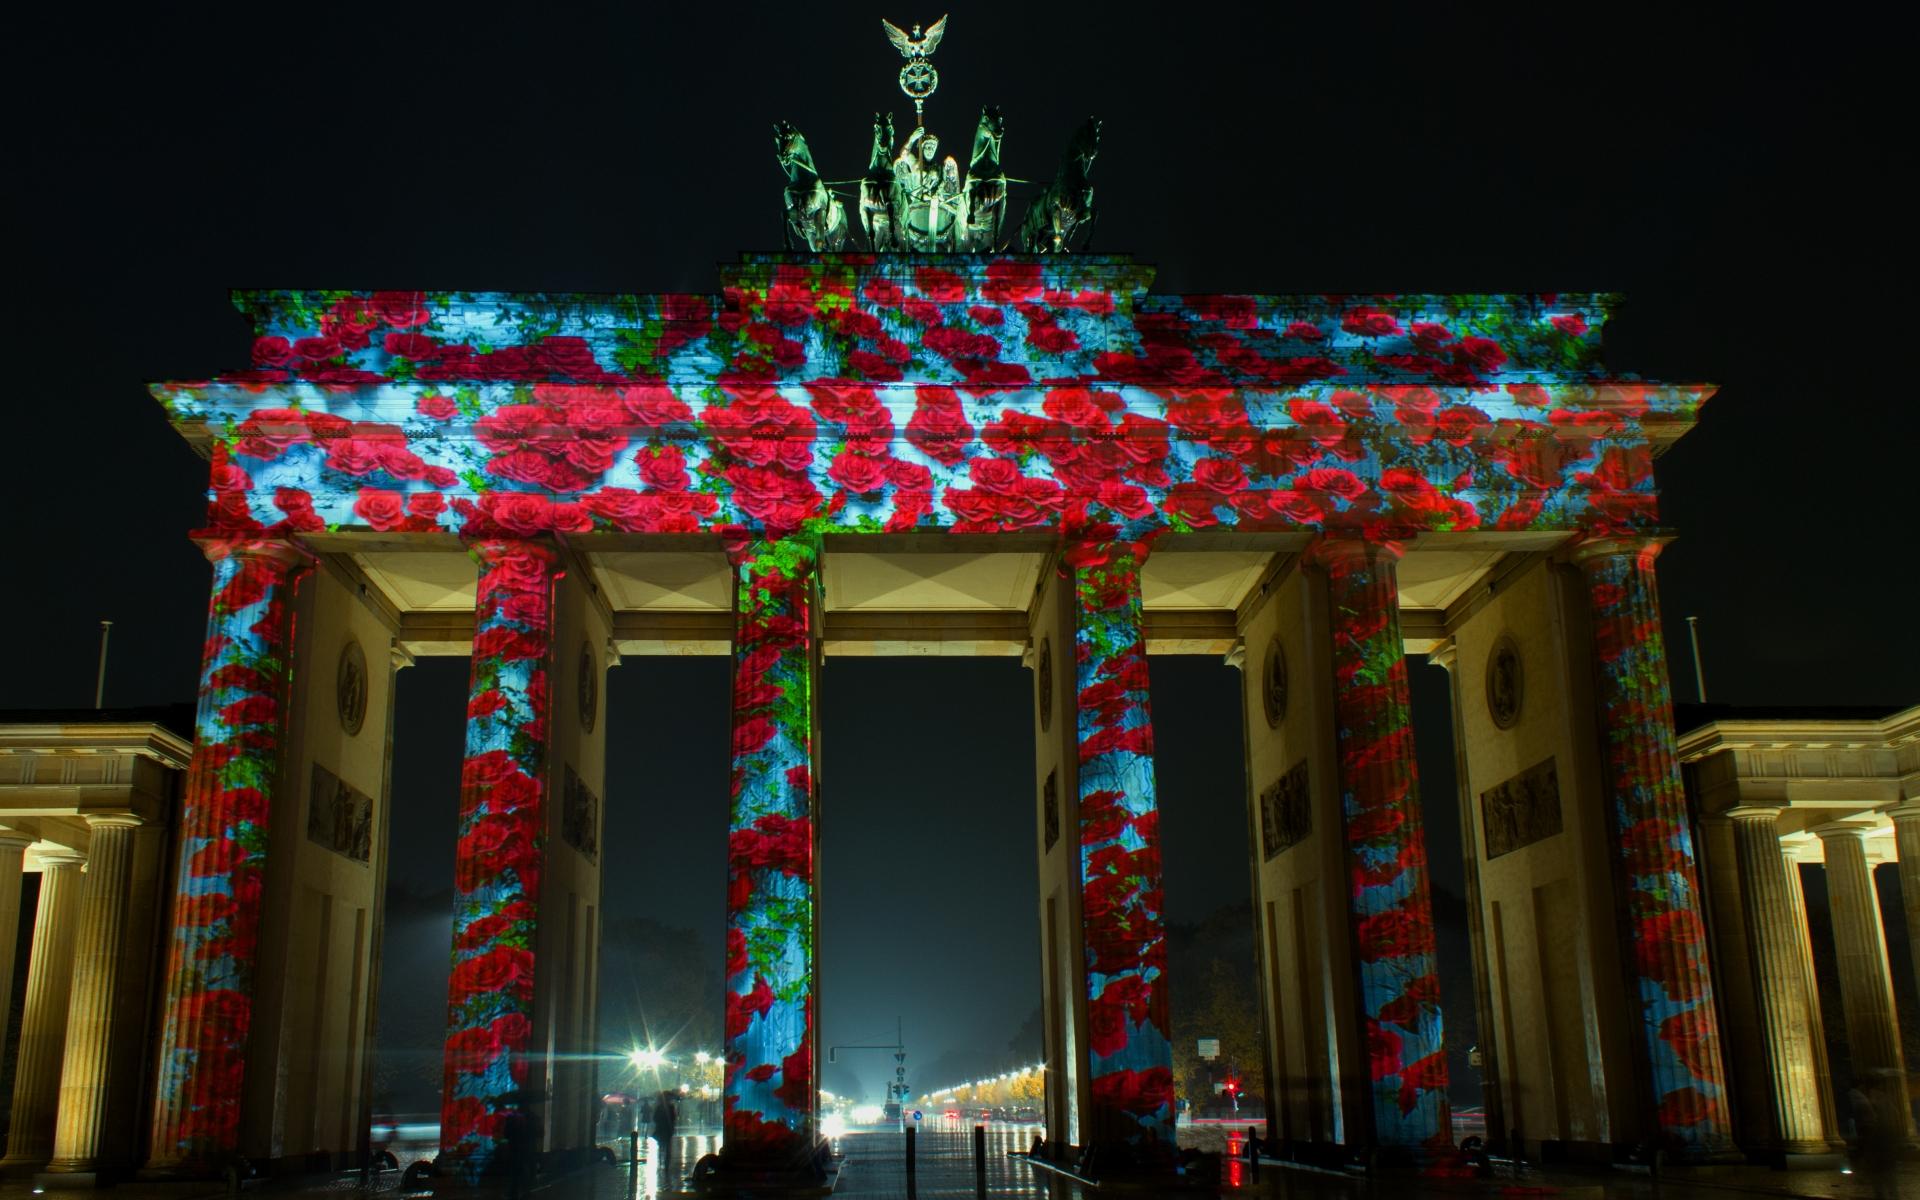 festival of lights hd wallpaper background image